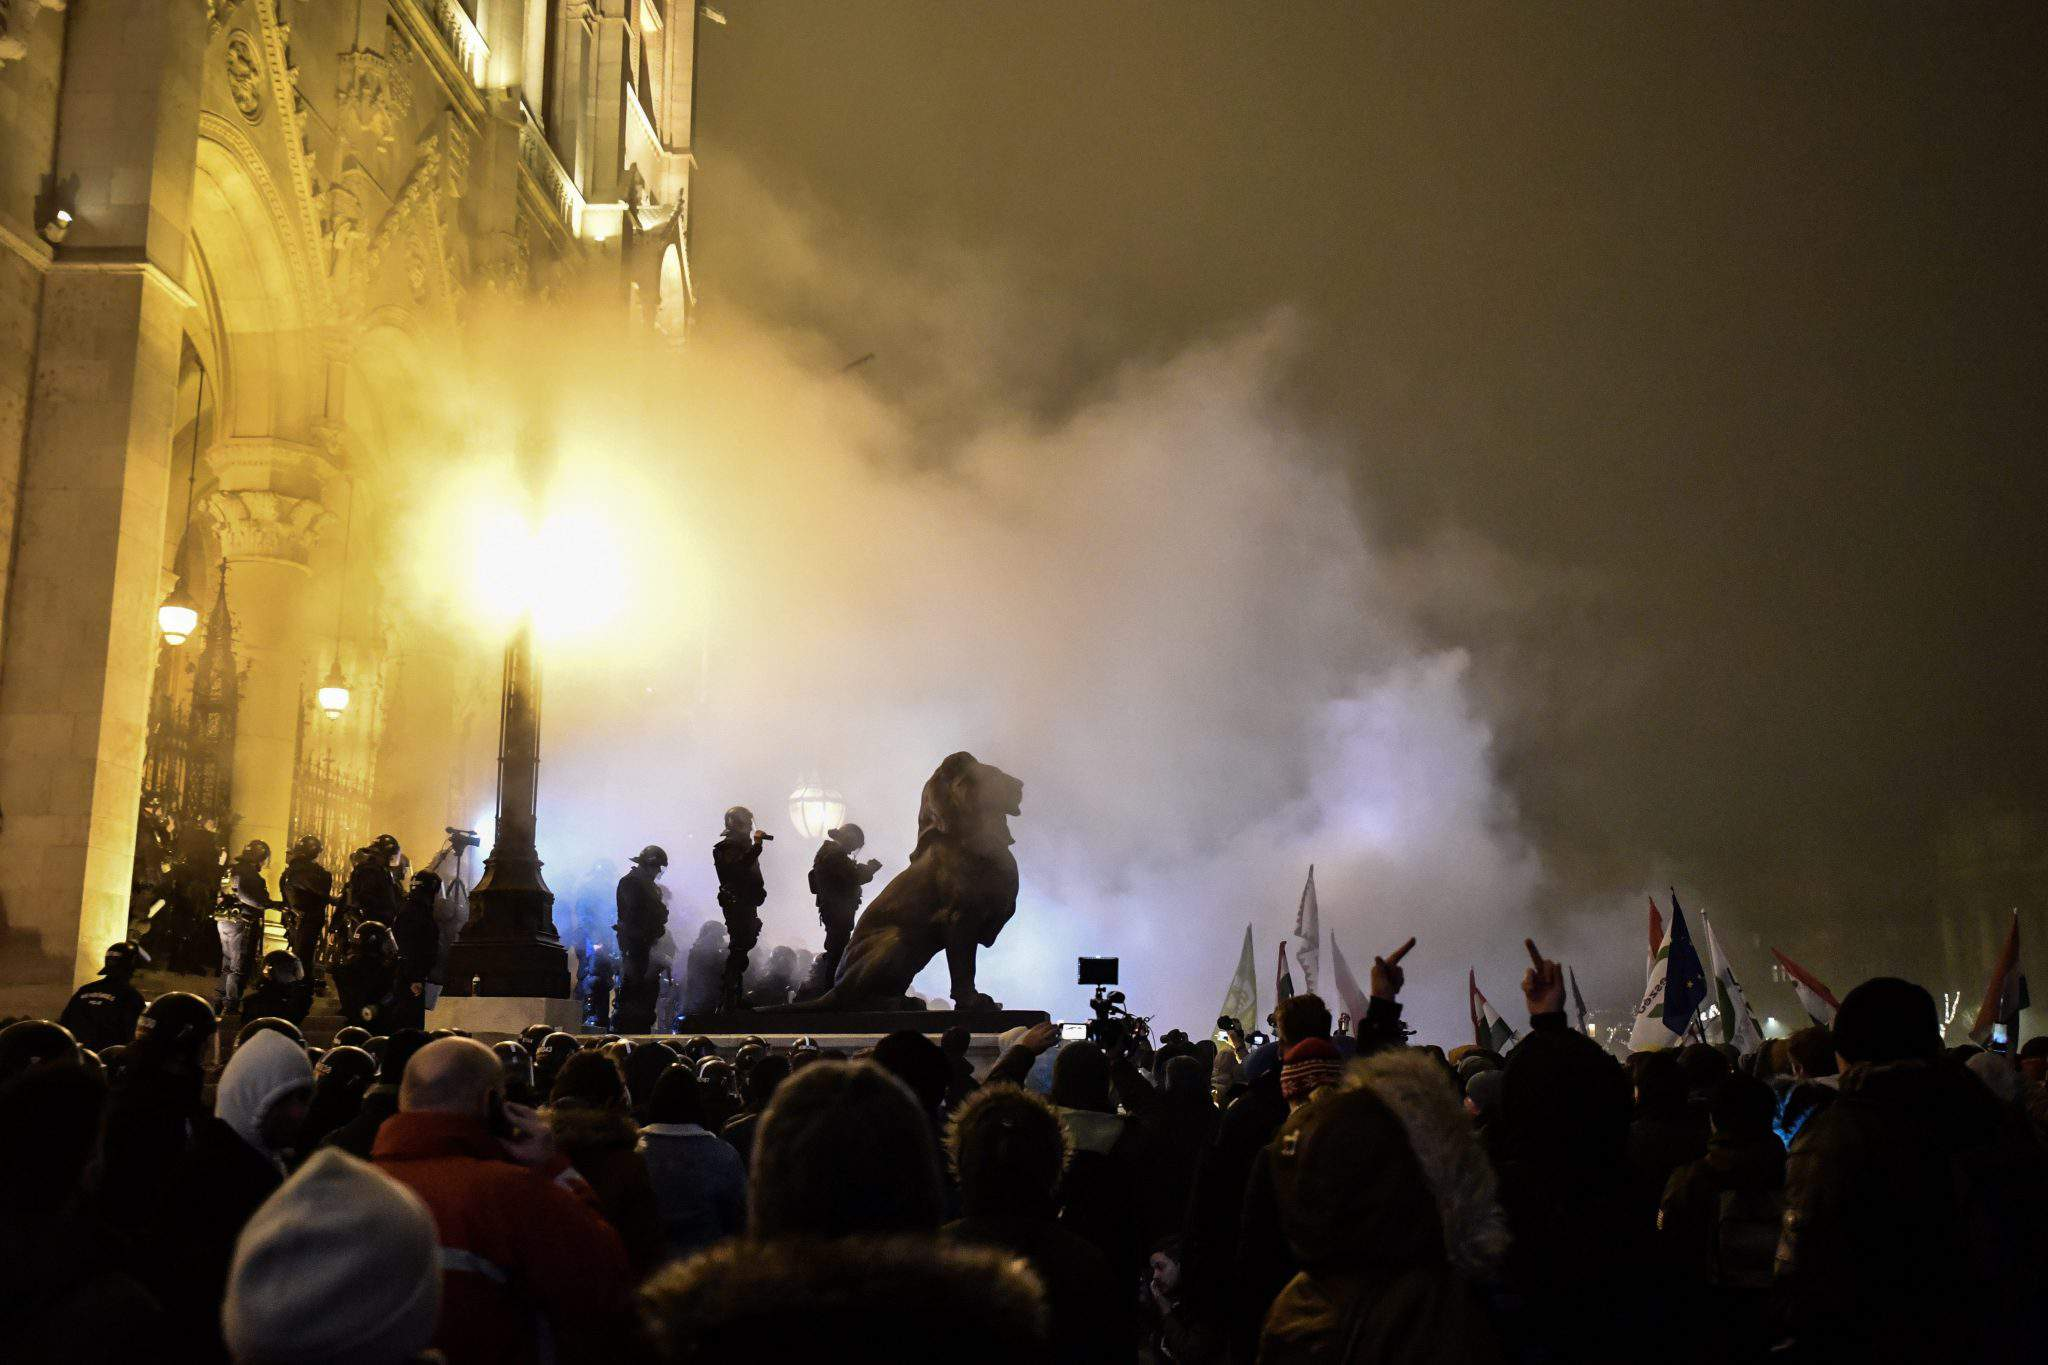 Demonstrators, police clash near the Hungarian Parliament - PHOTOS